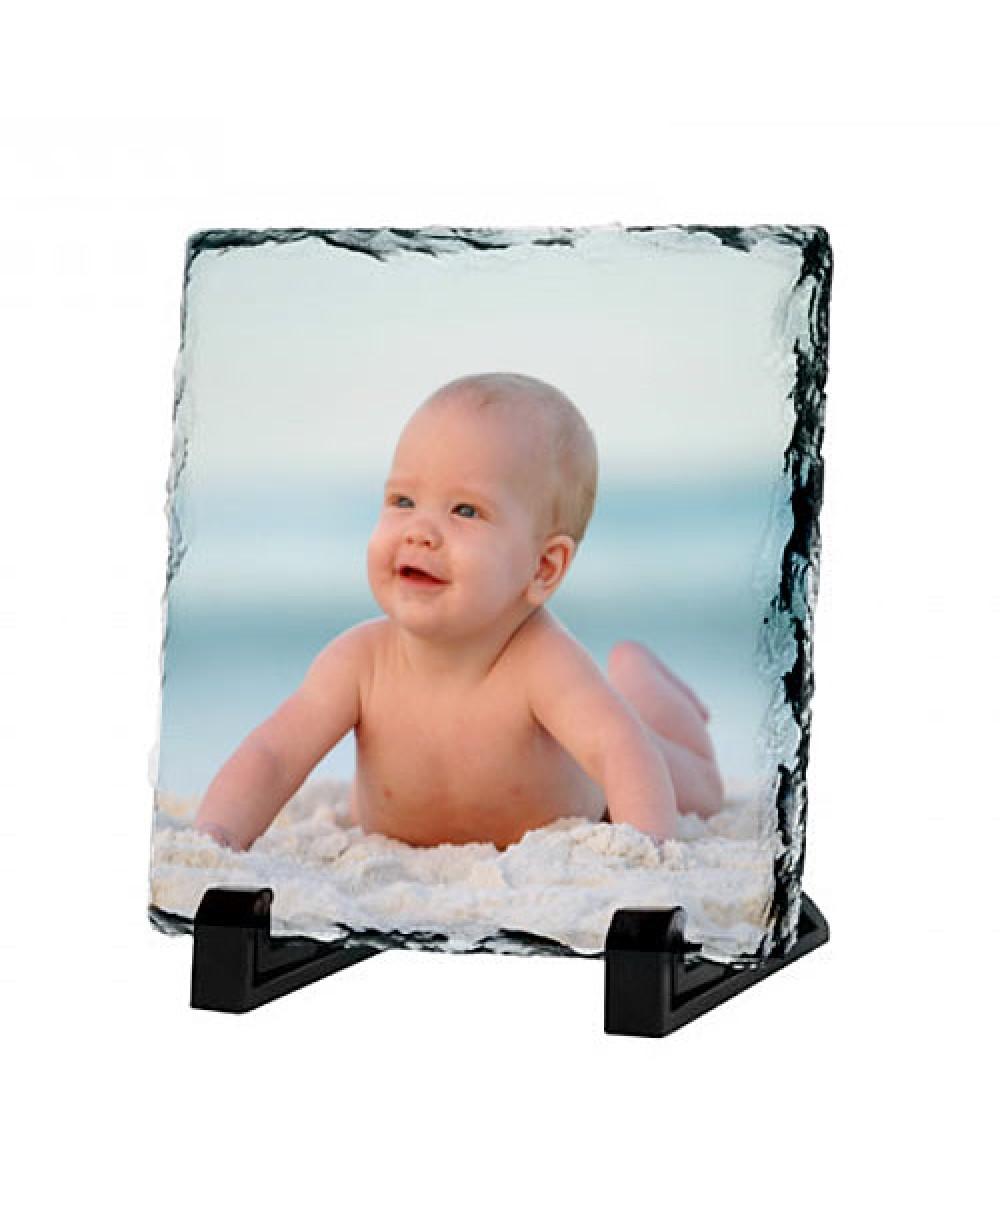 Square Photo Slates For Sublimation Blanks 20x20cm